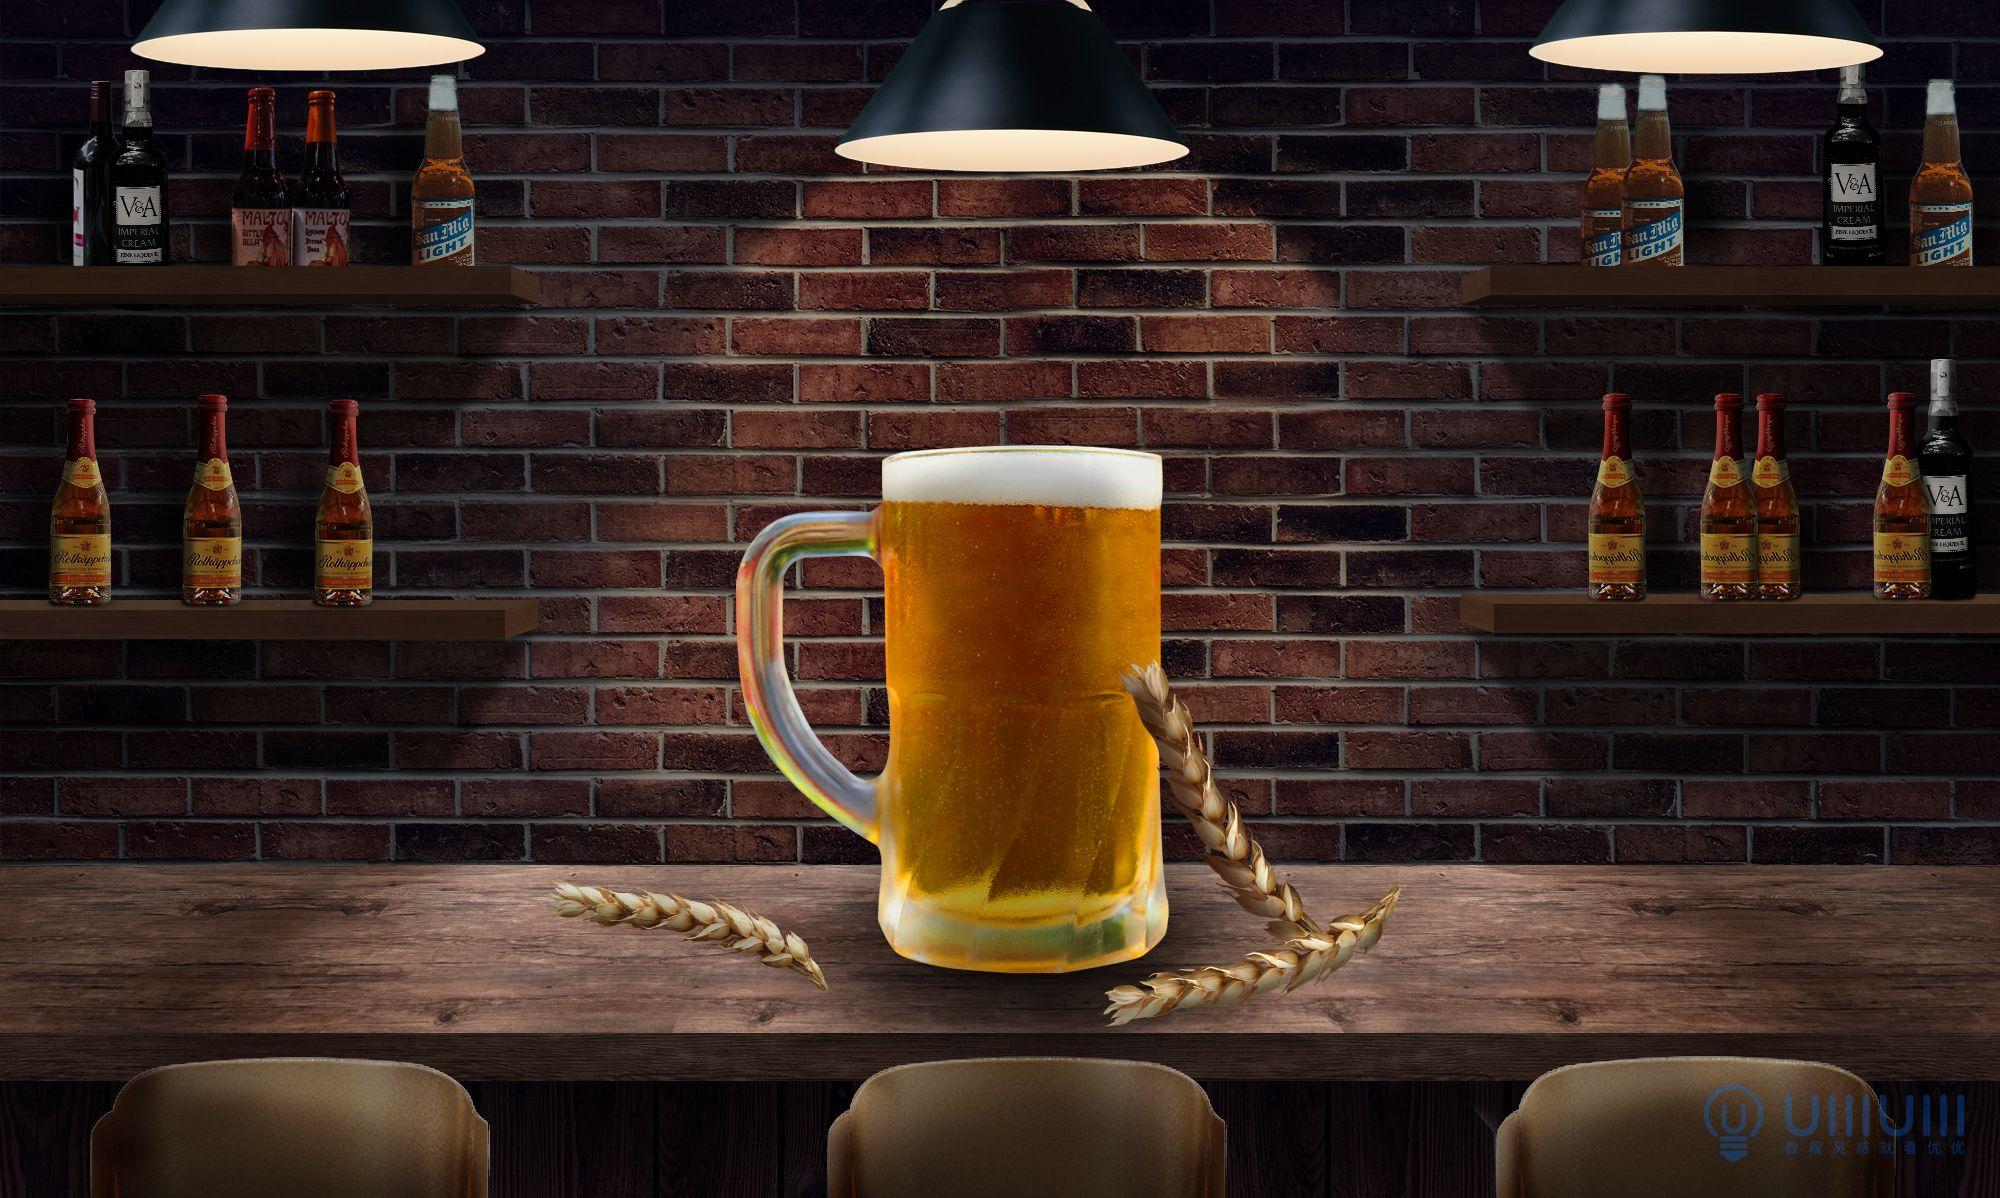 PS教程!手把手教你合成美味啤酒场景海报